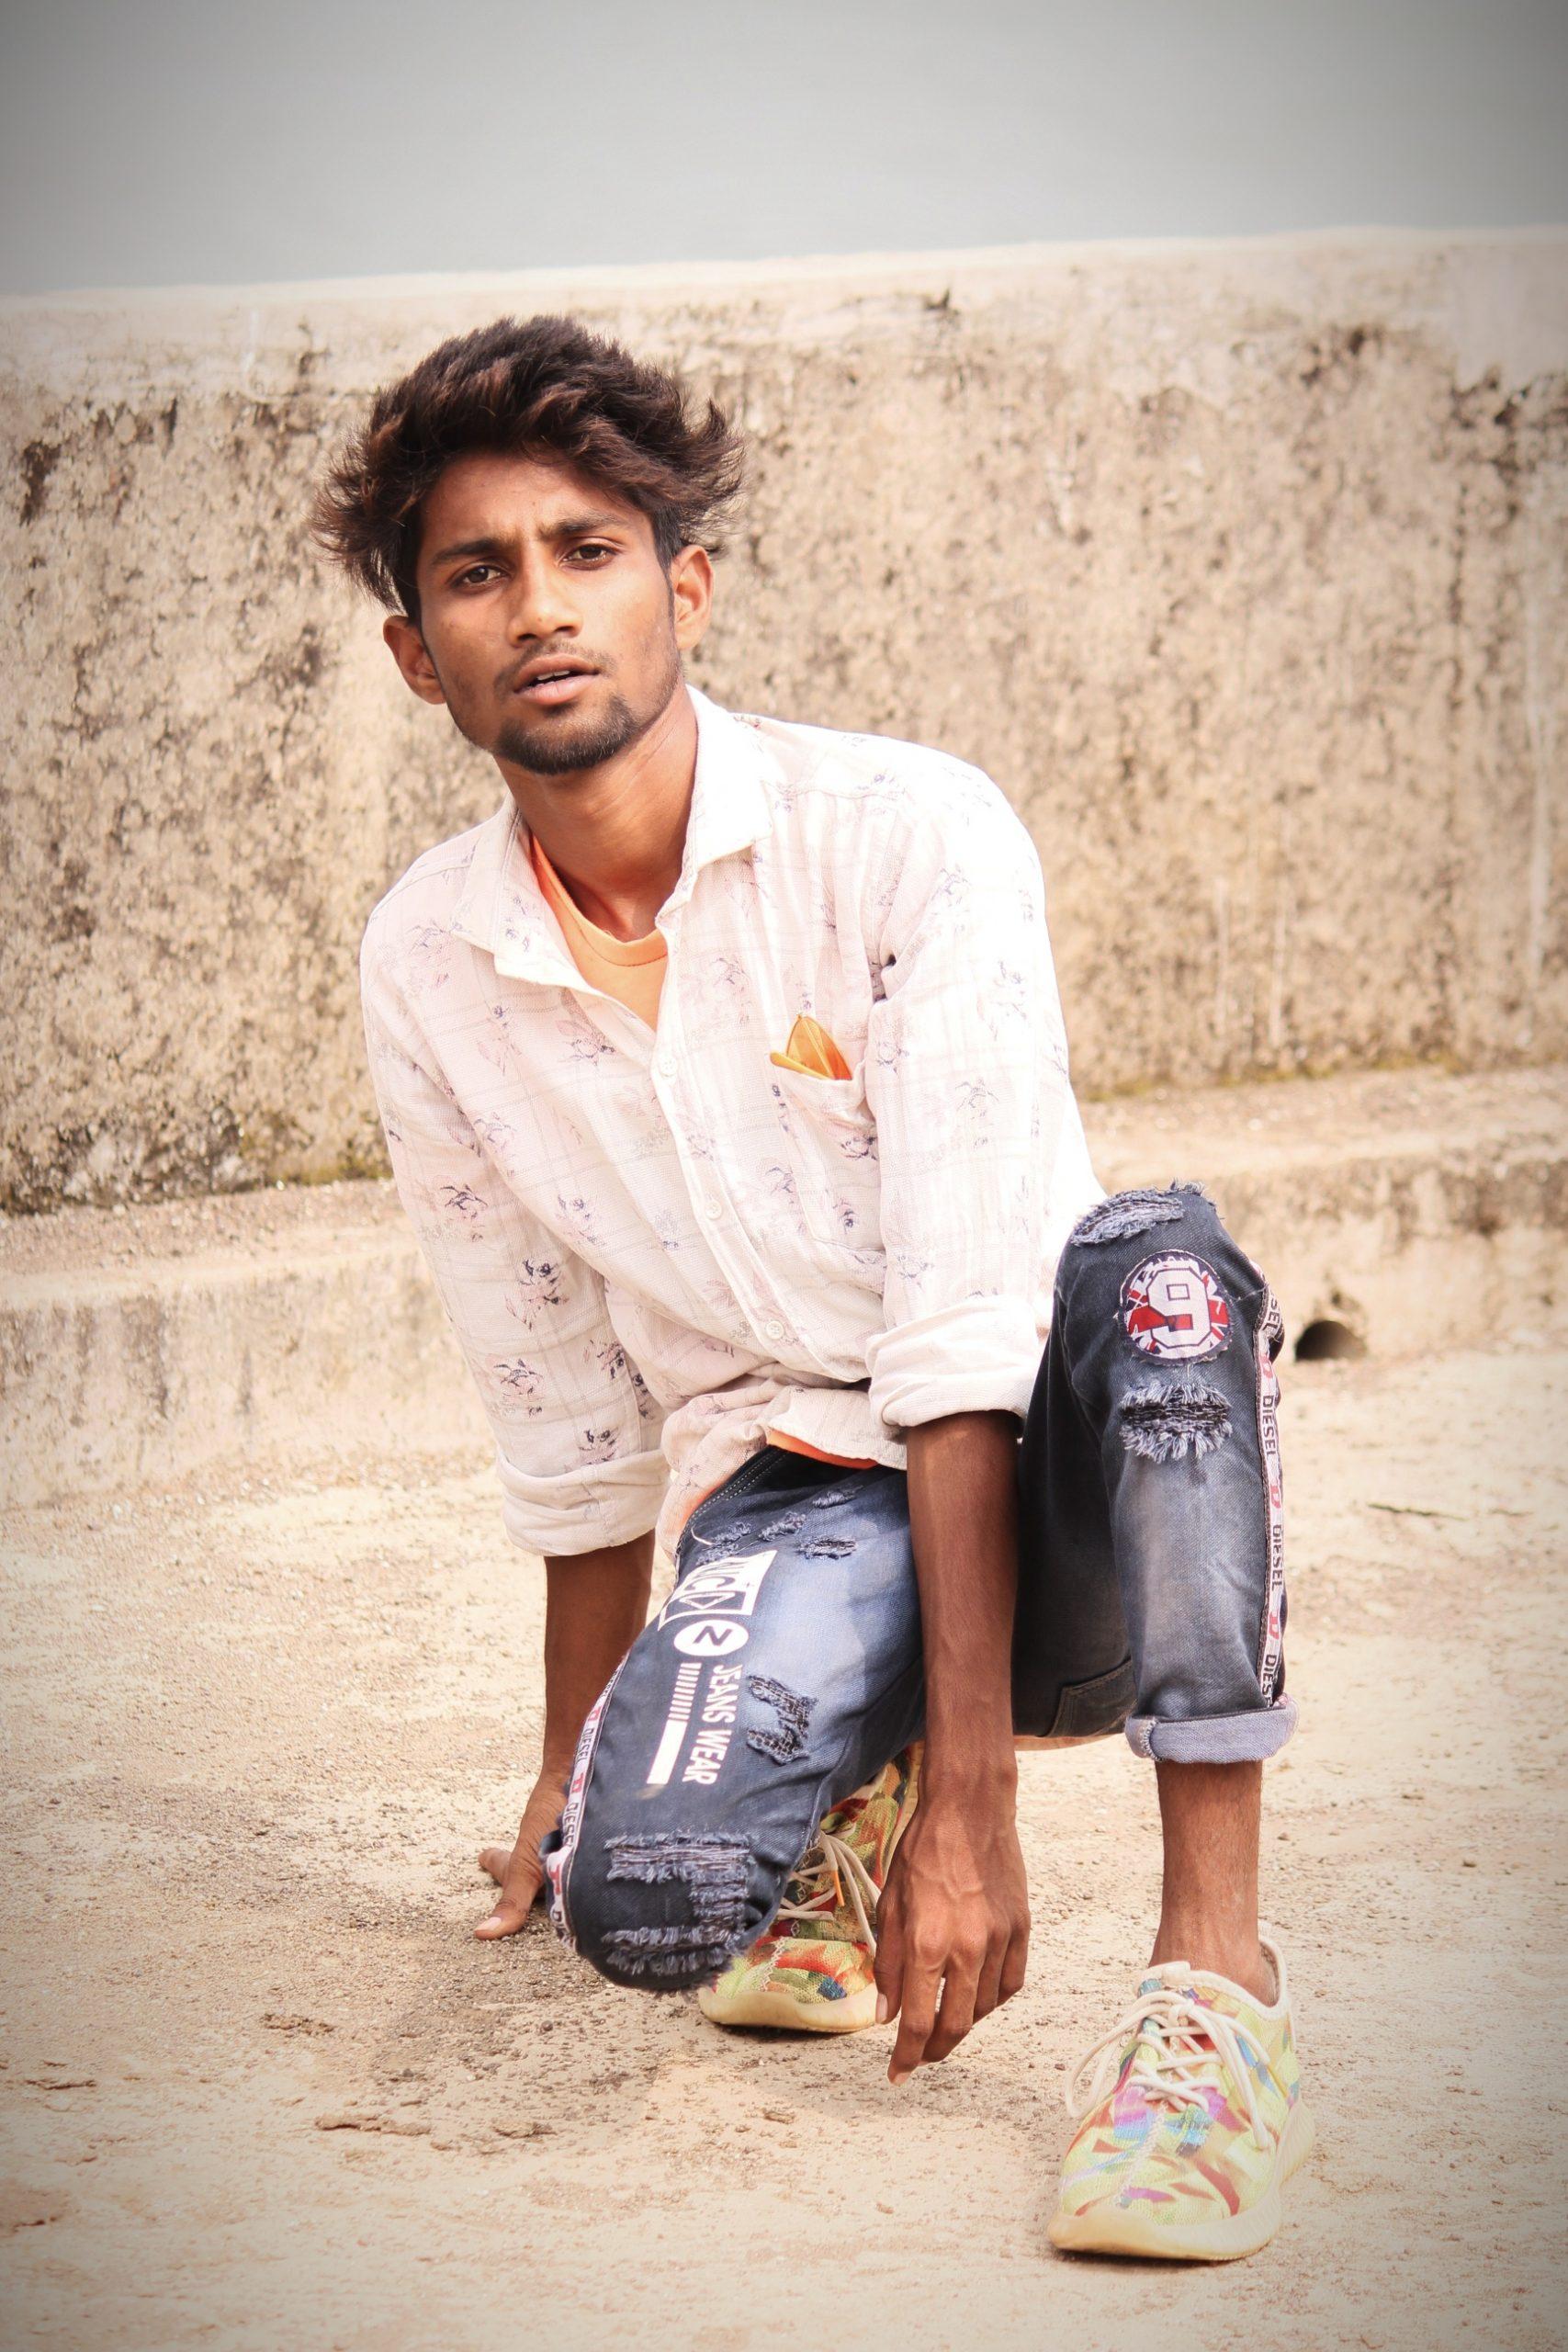 A street boy